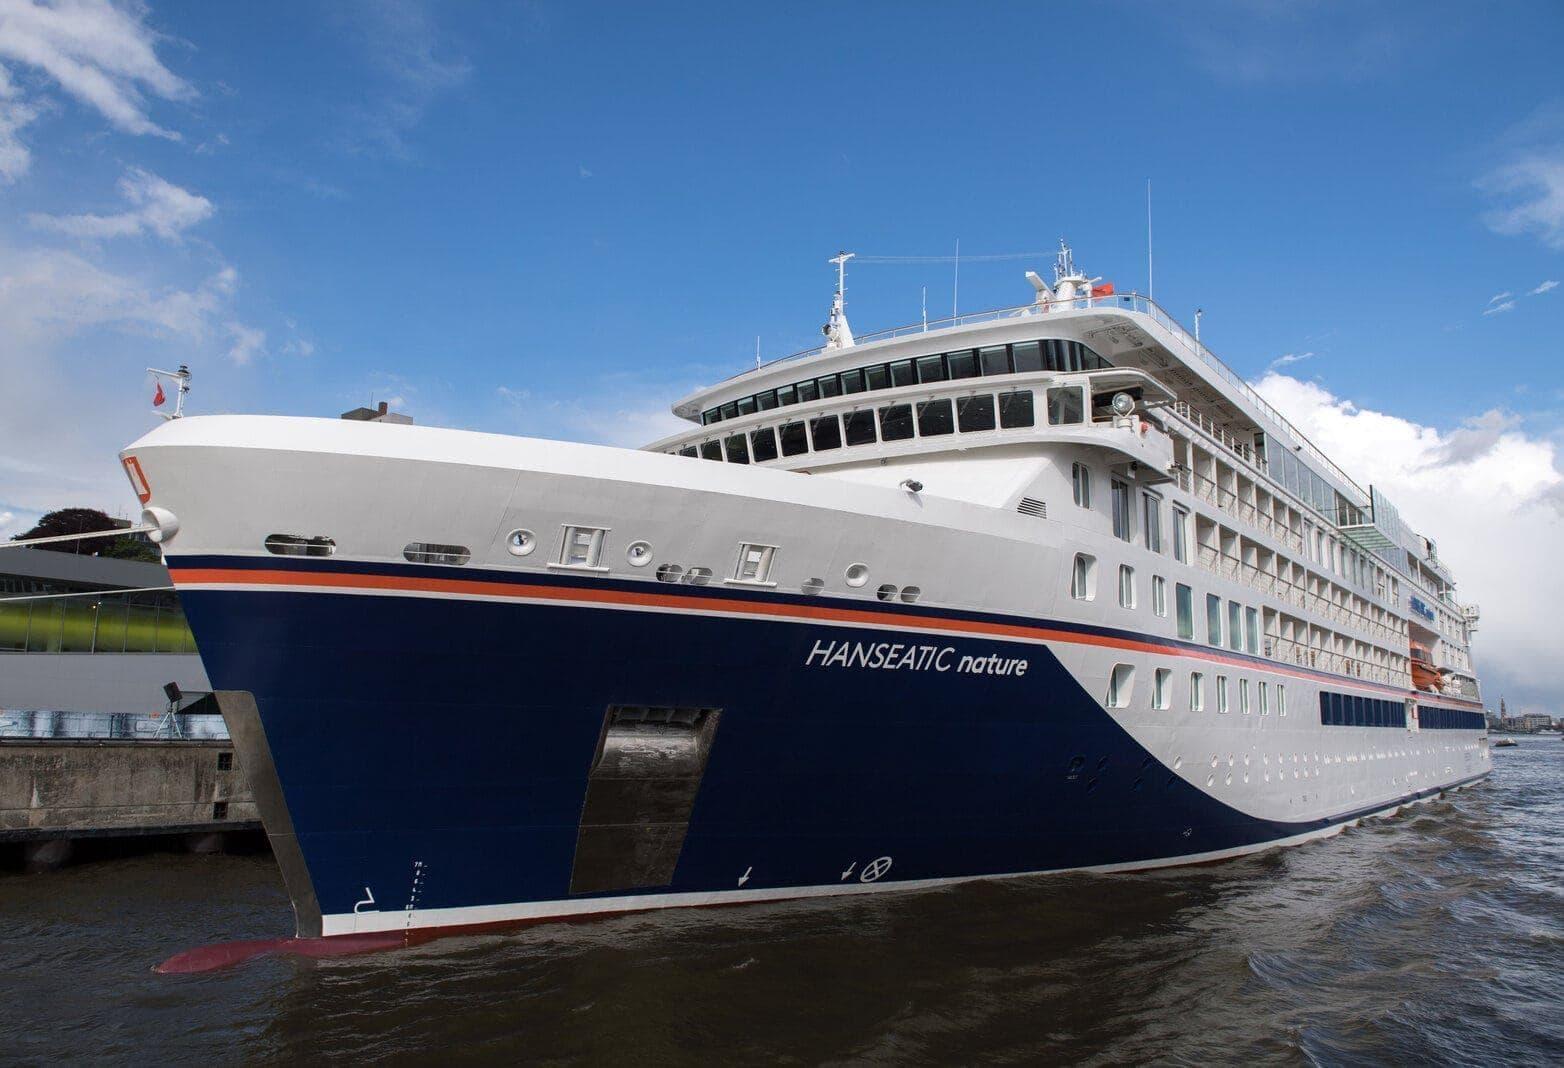 Kreuzfahrtschiff Hanseatic nature